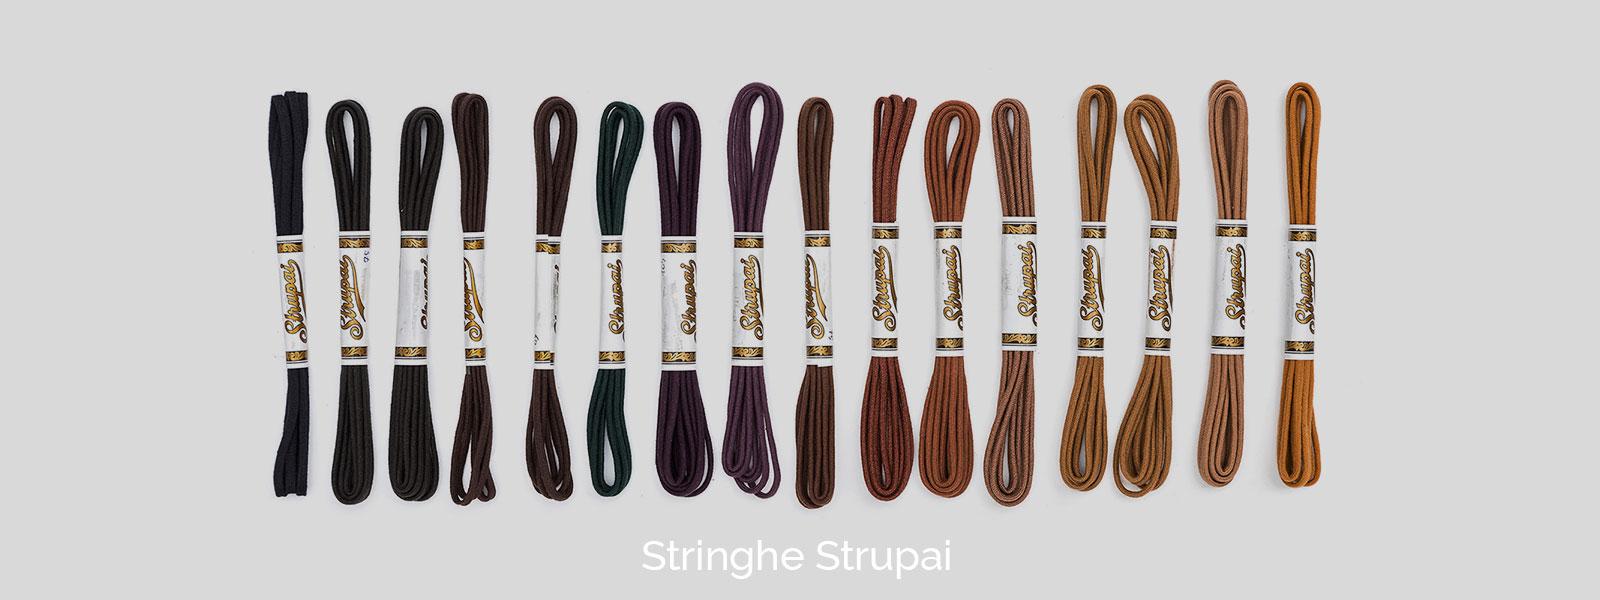 Calzoleria Rivolta | Strupai laces